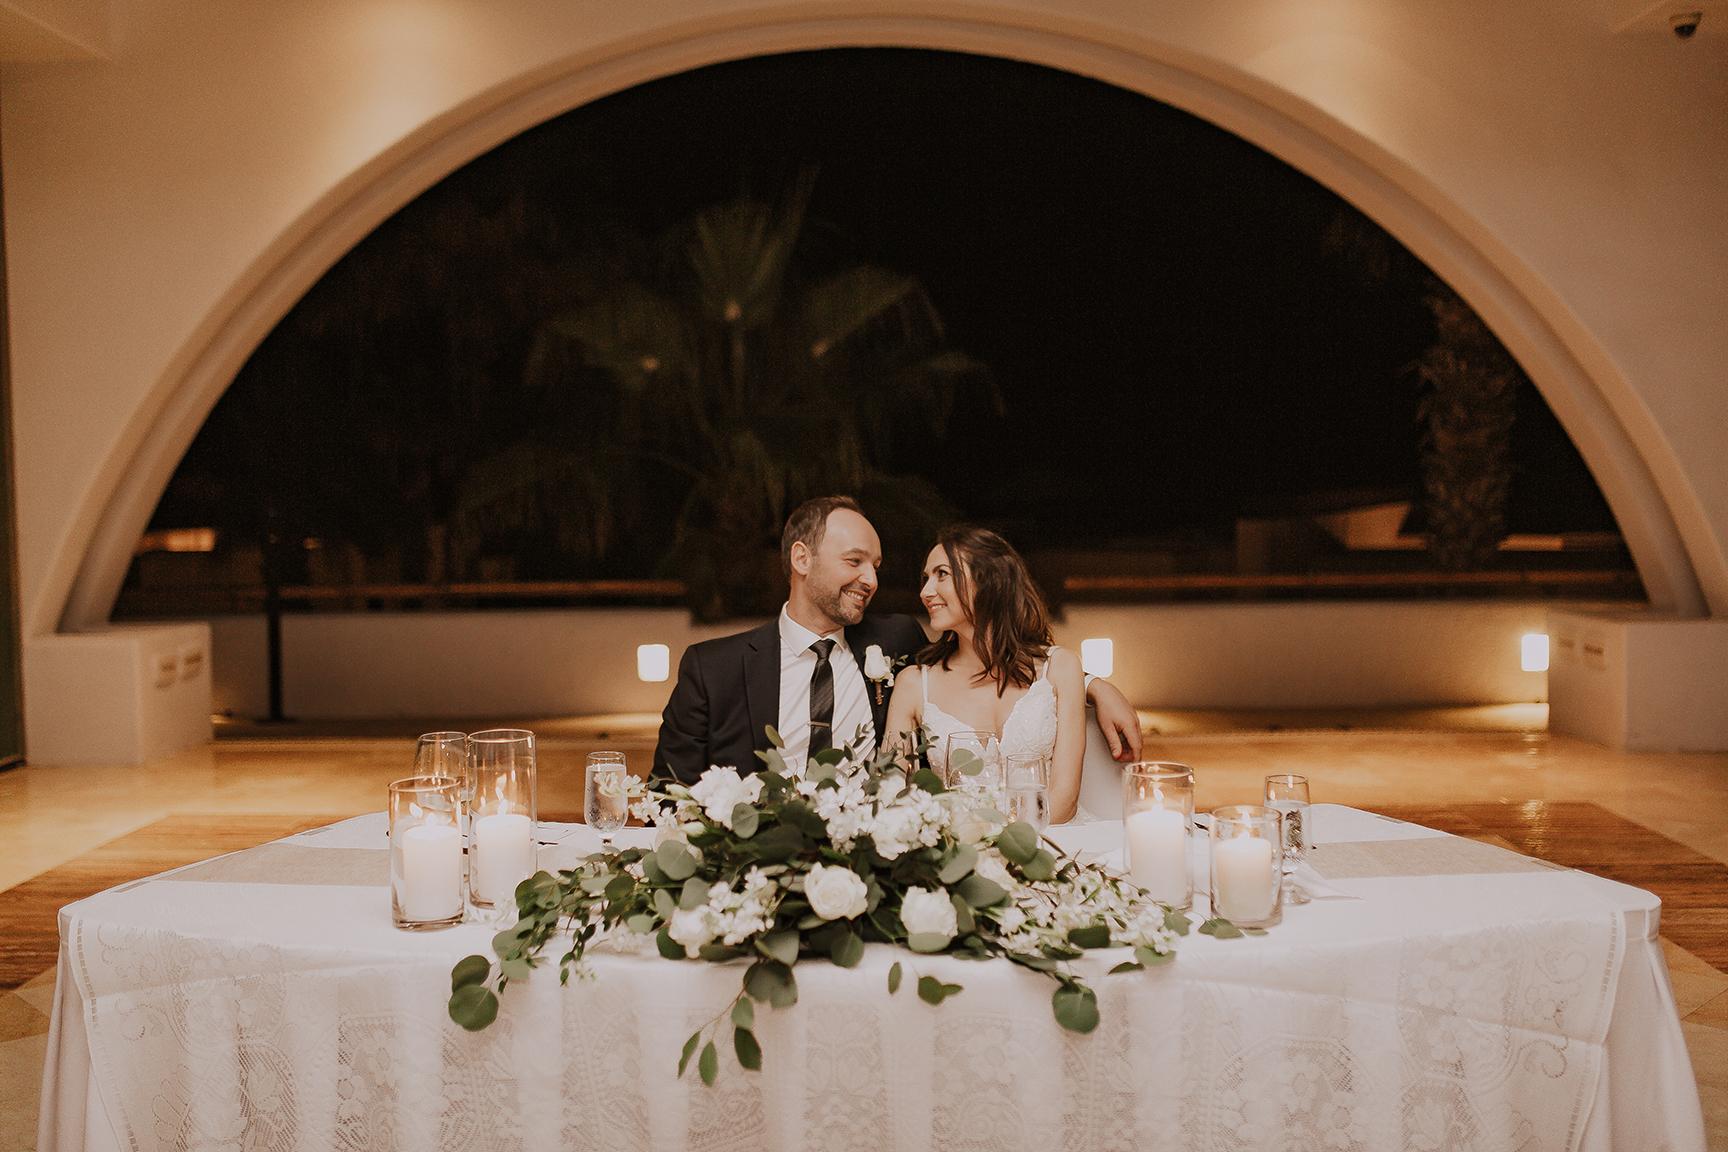 Lindsei+James_cabo_wedding_956.jpg